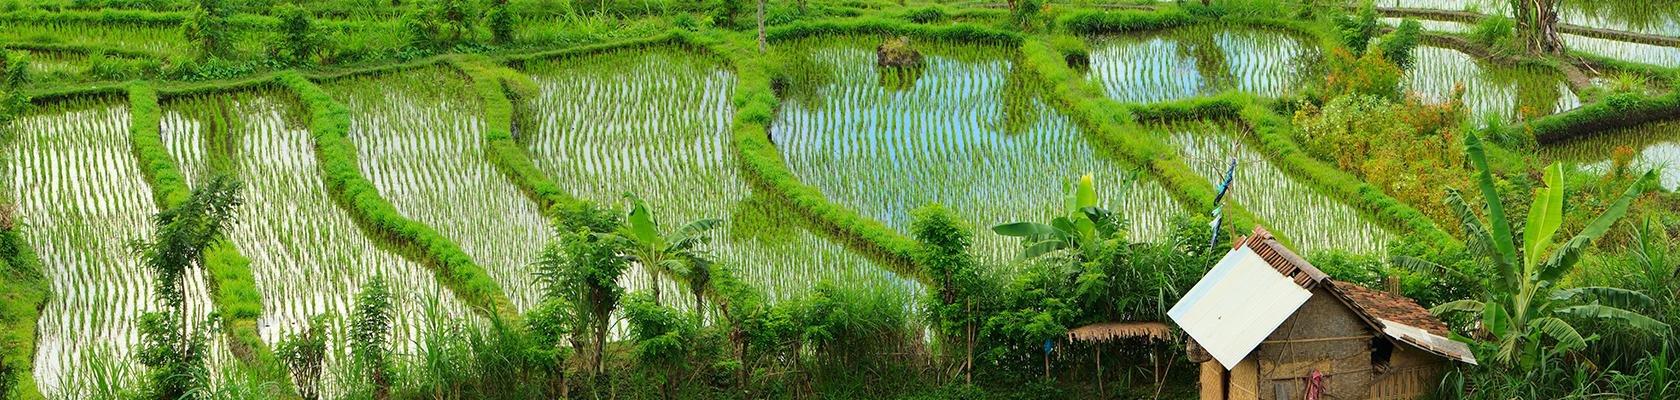 Indonesië - Bali - Rijstvelden